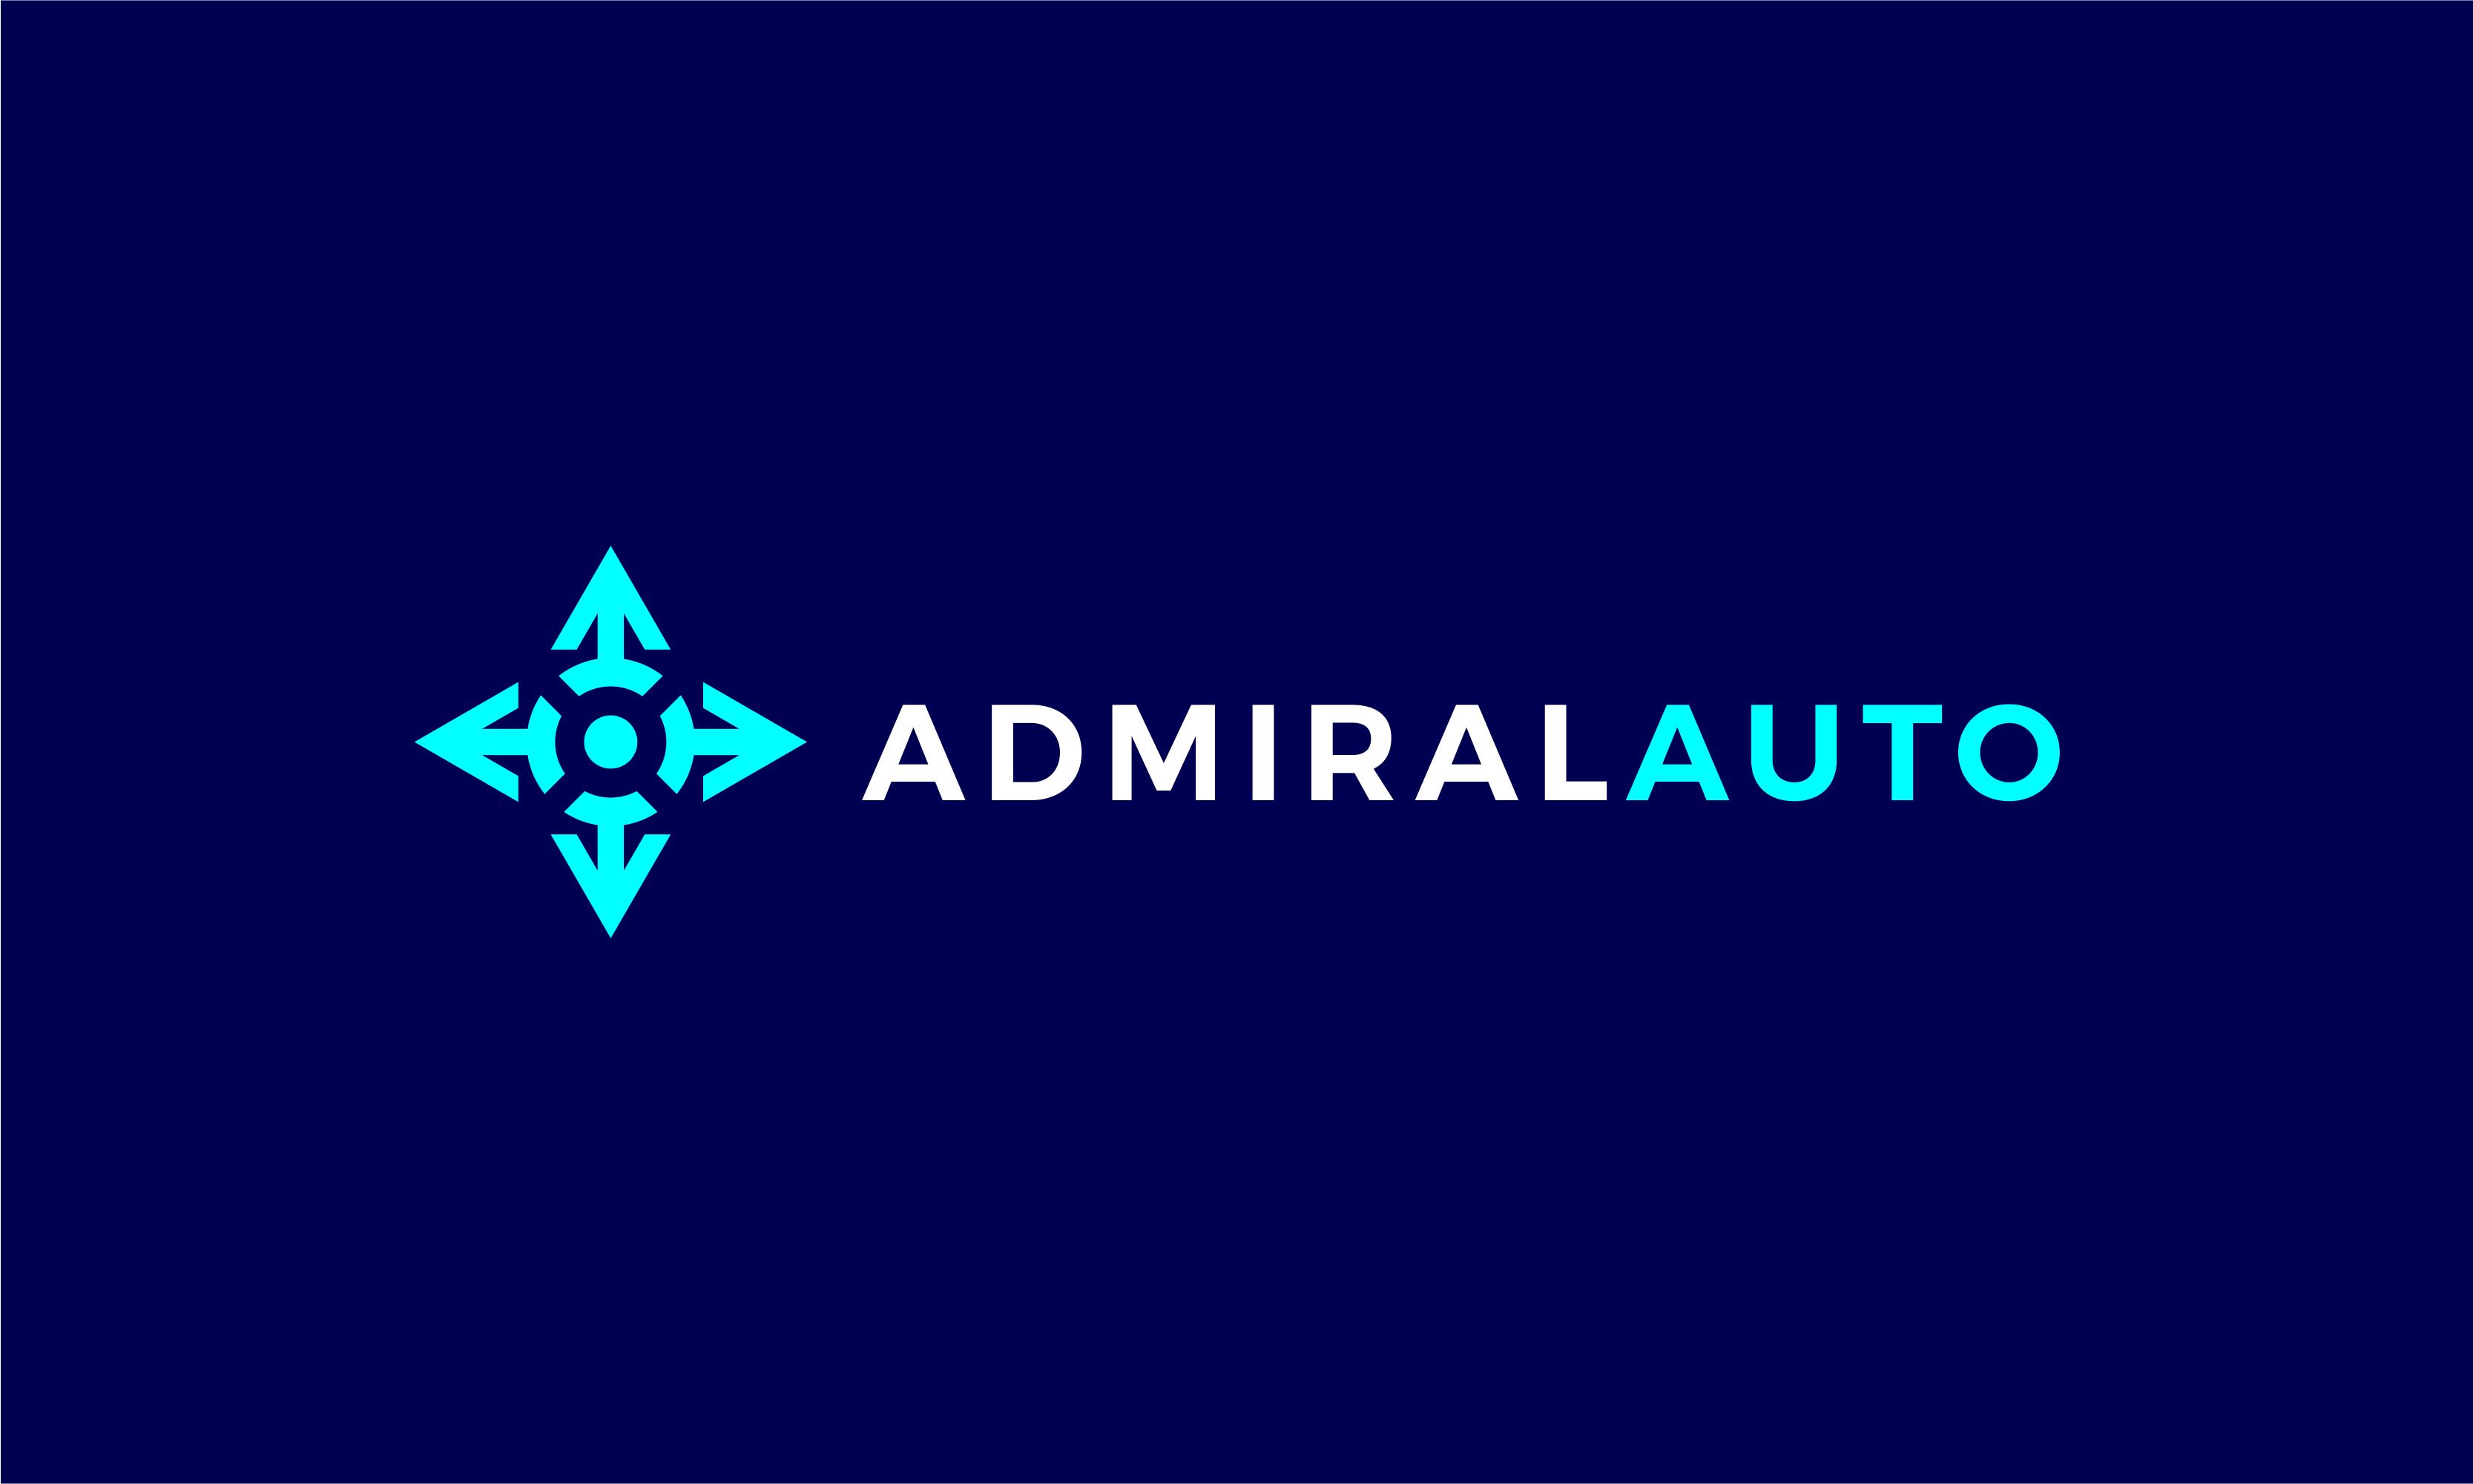 Admiralauto